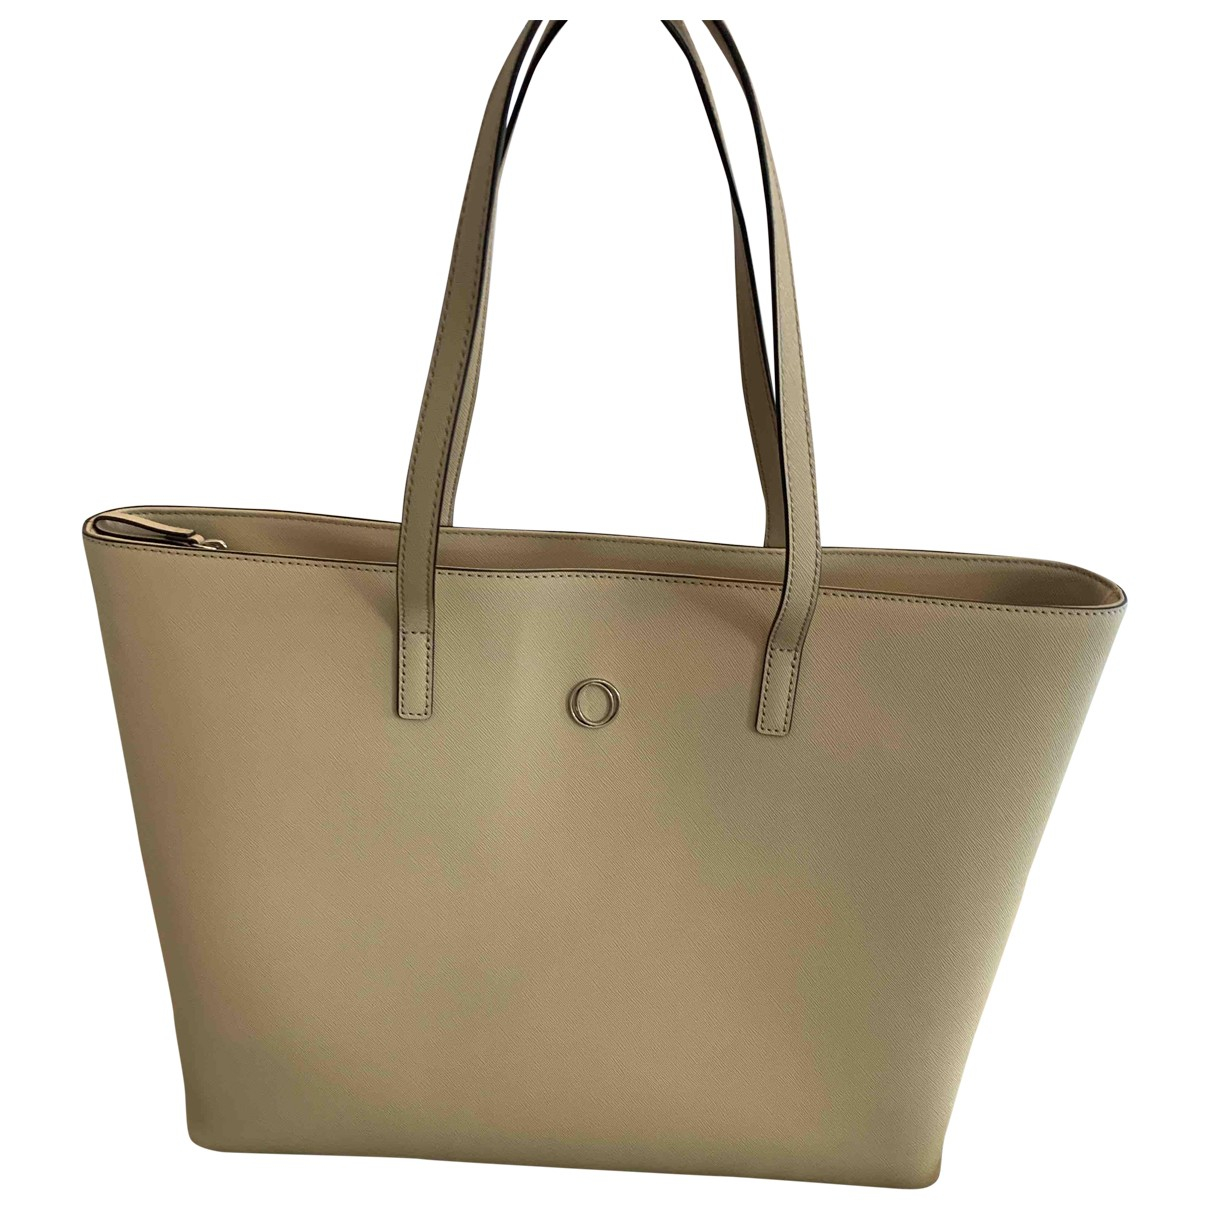 Oroton - Sac a main   pour femme en cuir - beige